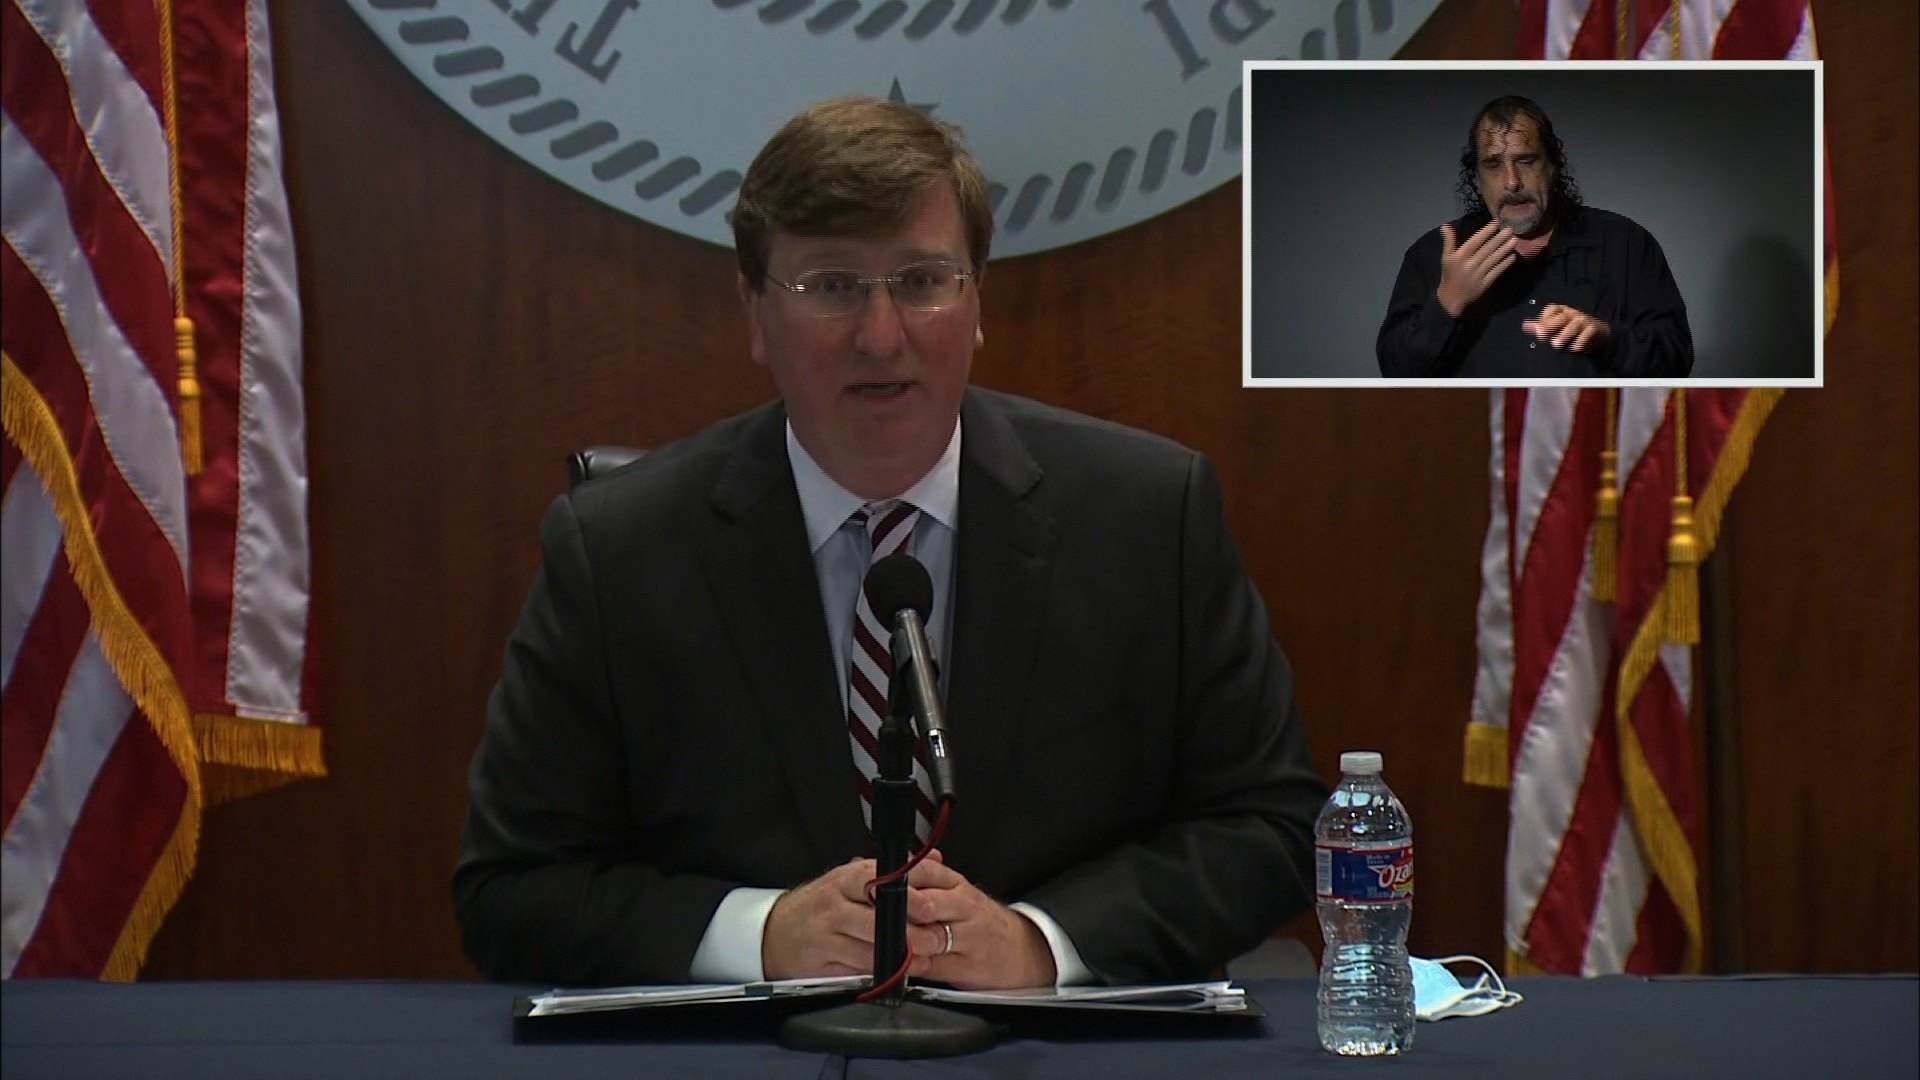 Mississippi Gov. Tate Reeves speaks during a press conference in Jackson, Mississippi, on November 24.